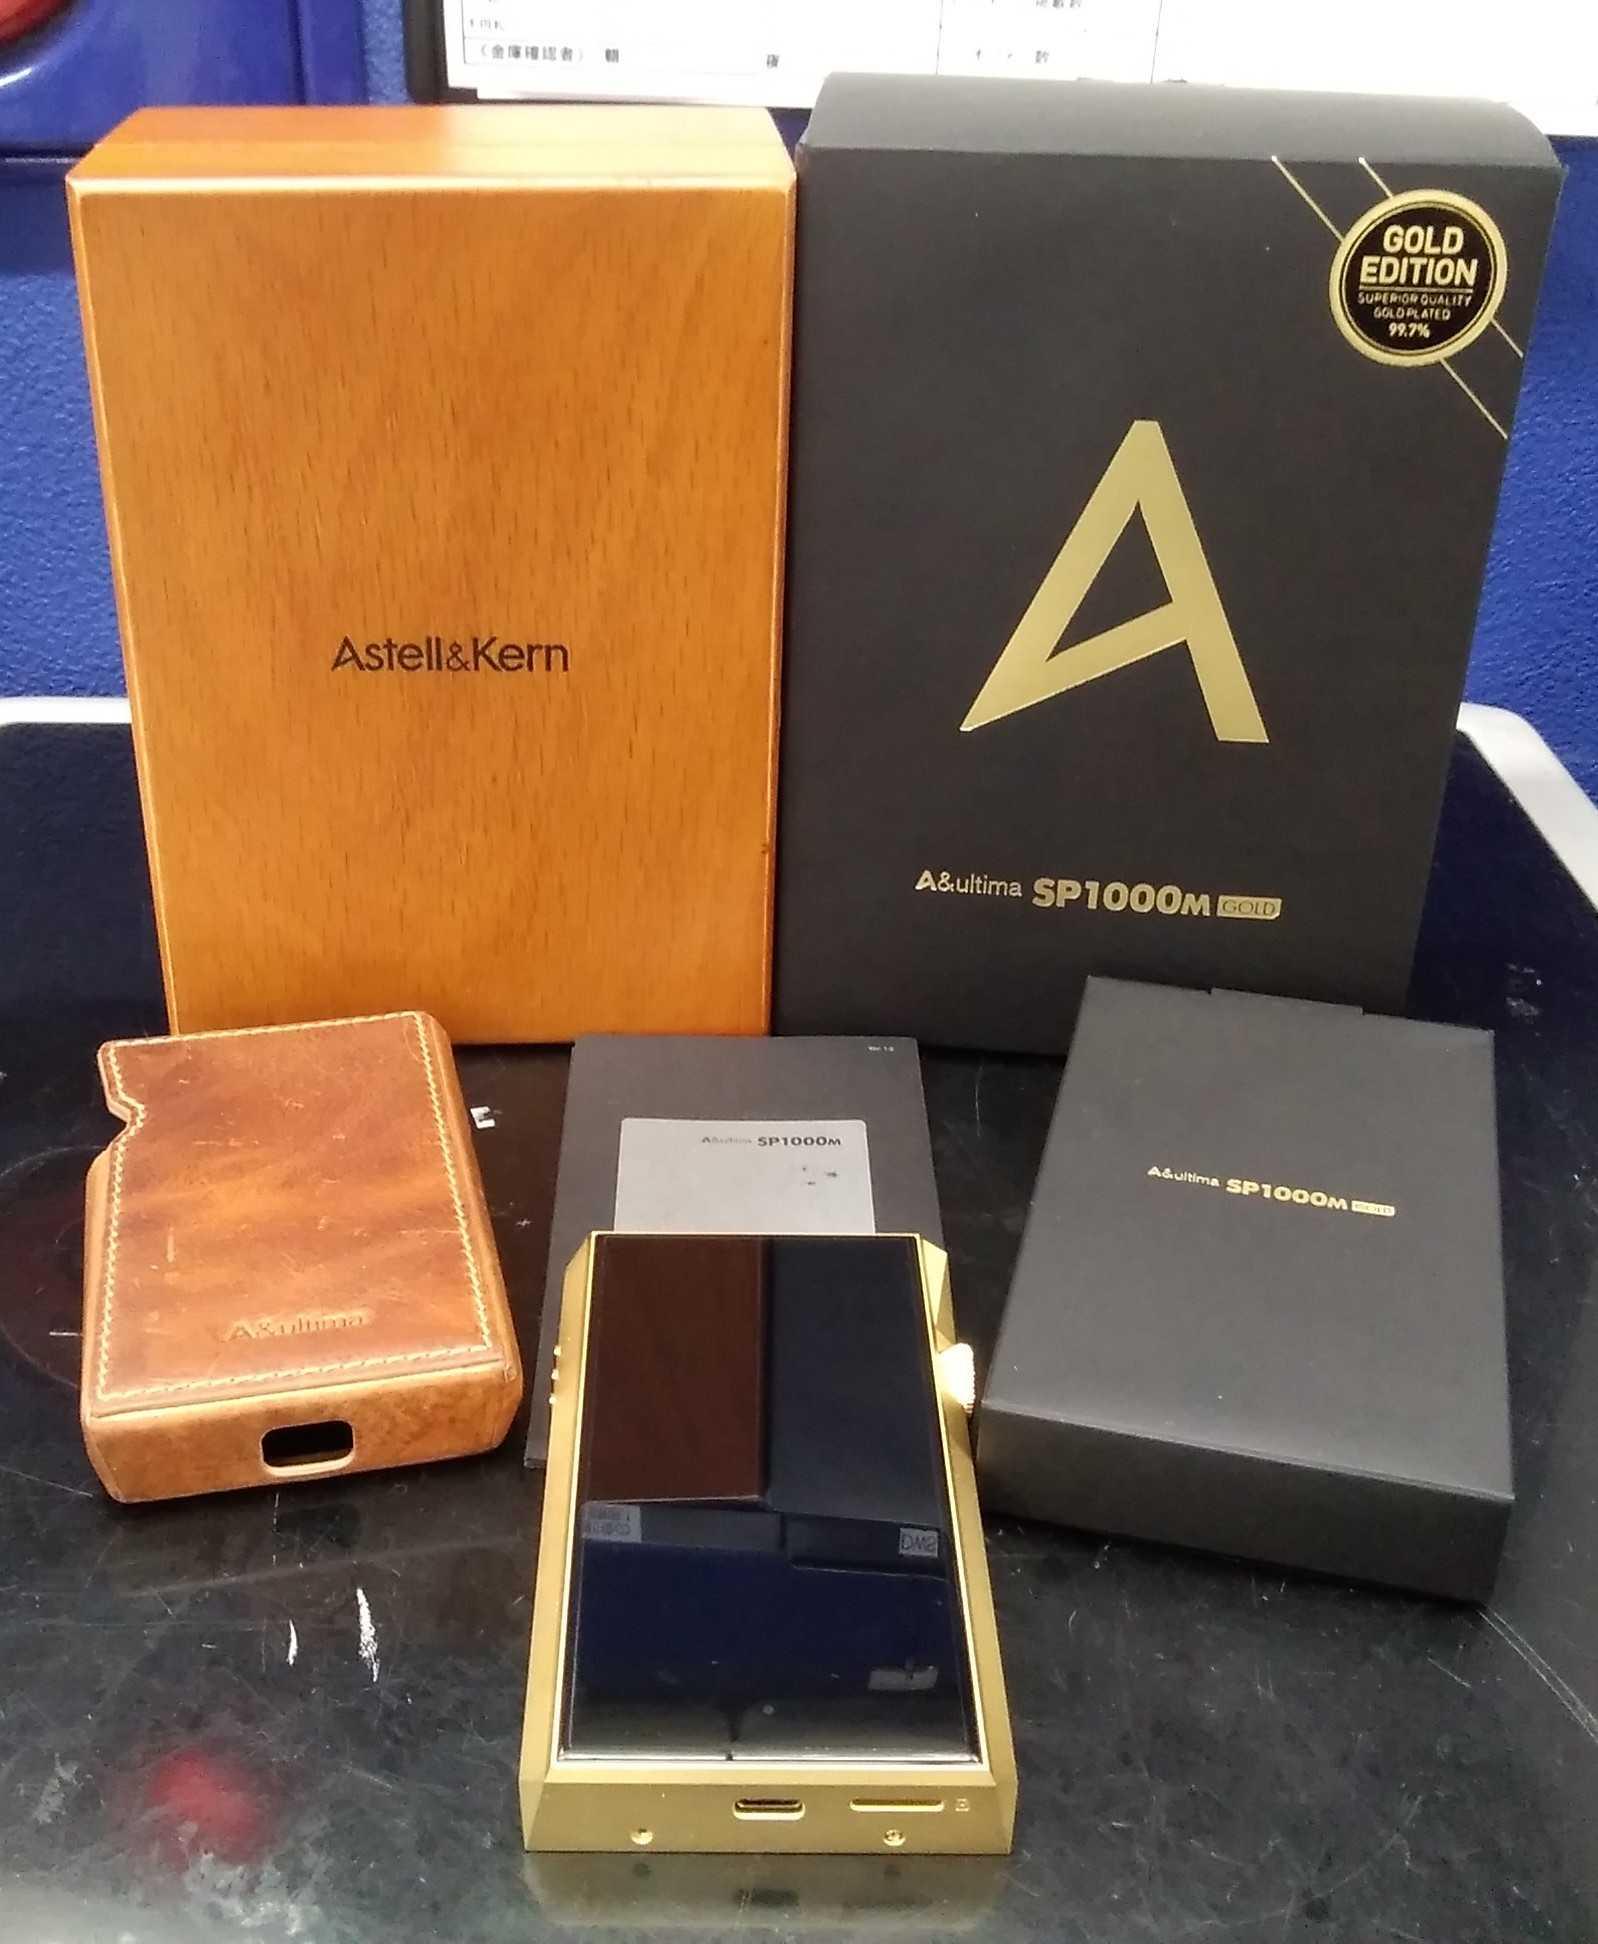 256GB 国内200台限定生産 純度99.7%金メッキ|ASTELL&KERN